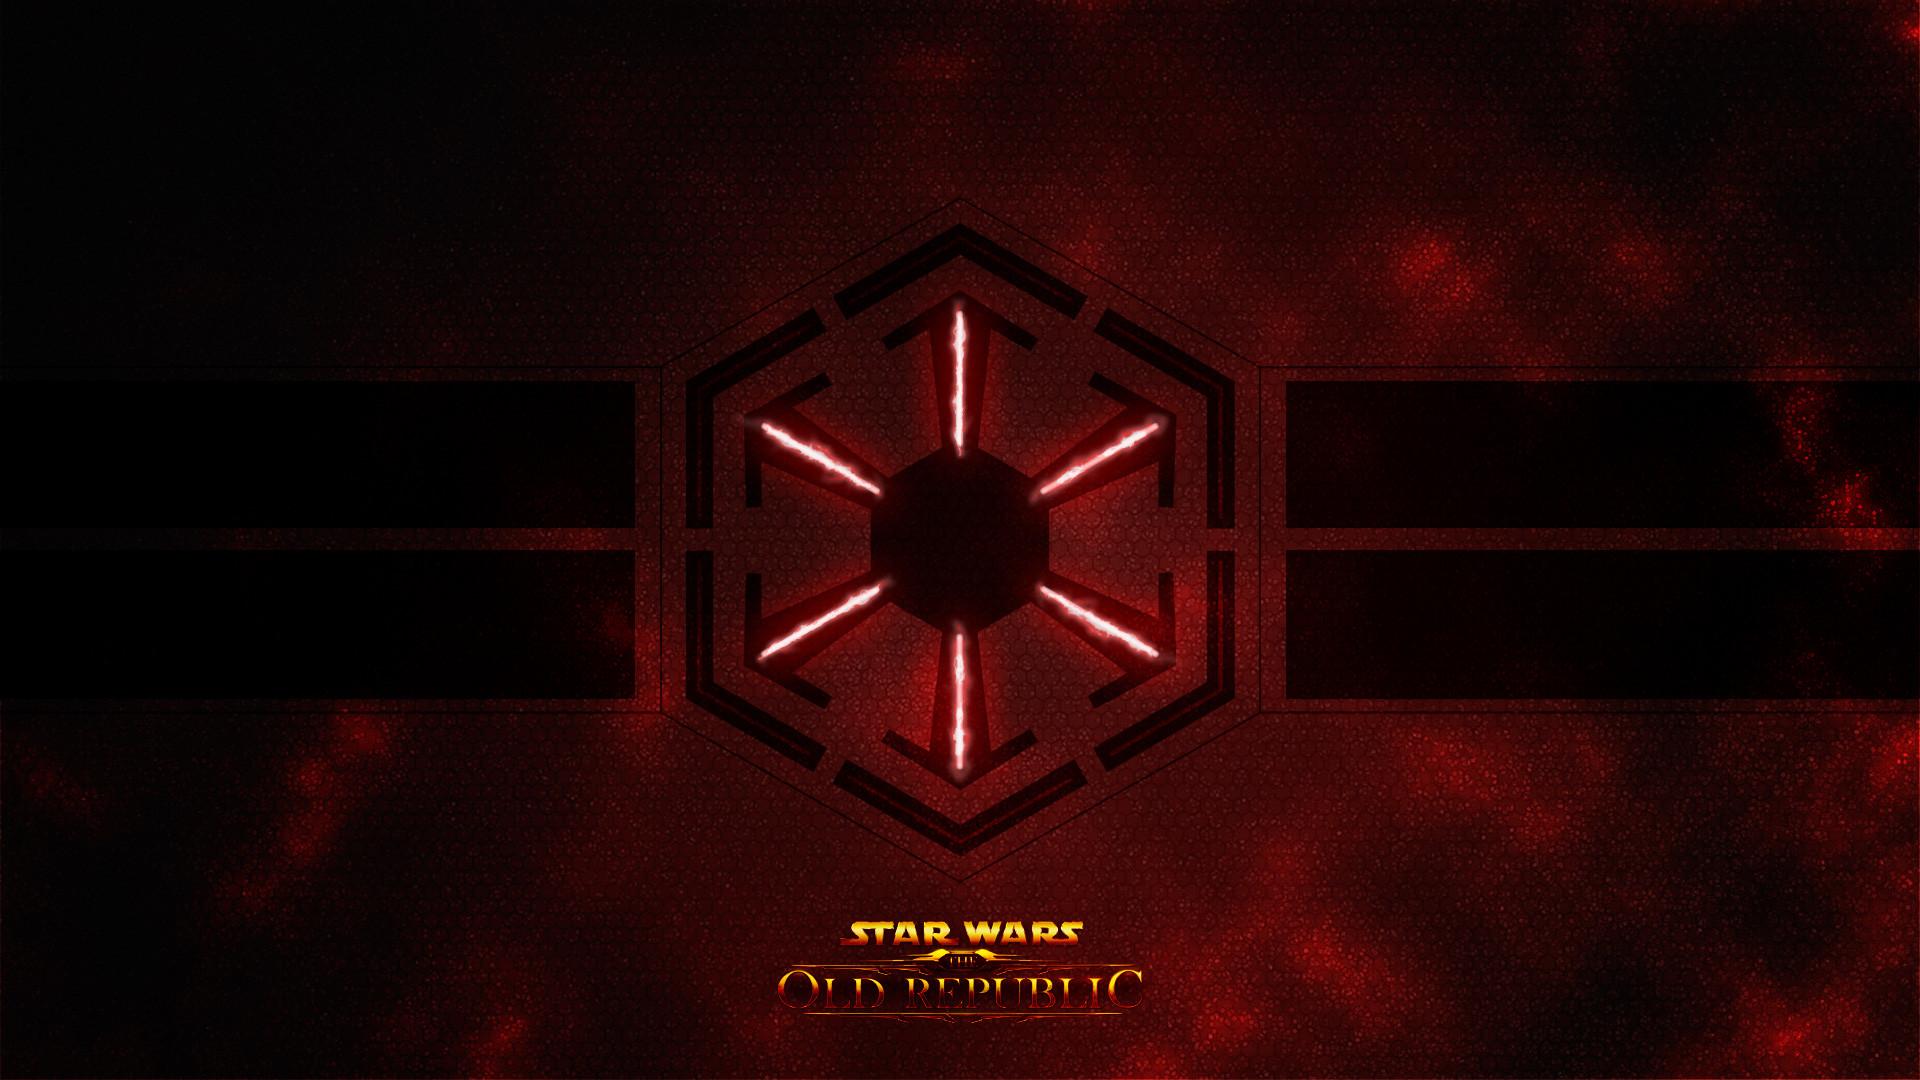 Res: 1920x1080, Computerspiele - Star Wars: The Old Republic Star Wars Sith (Star Wars)  Wallpaper